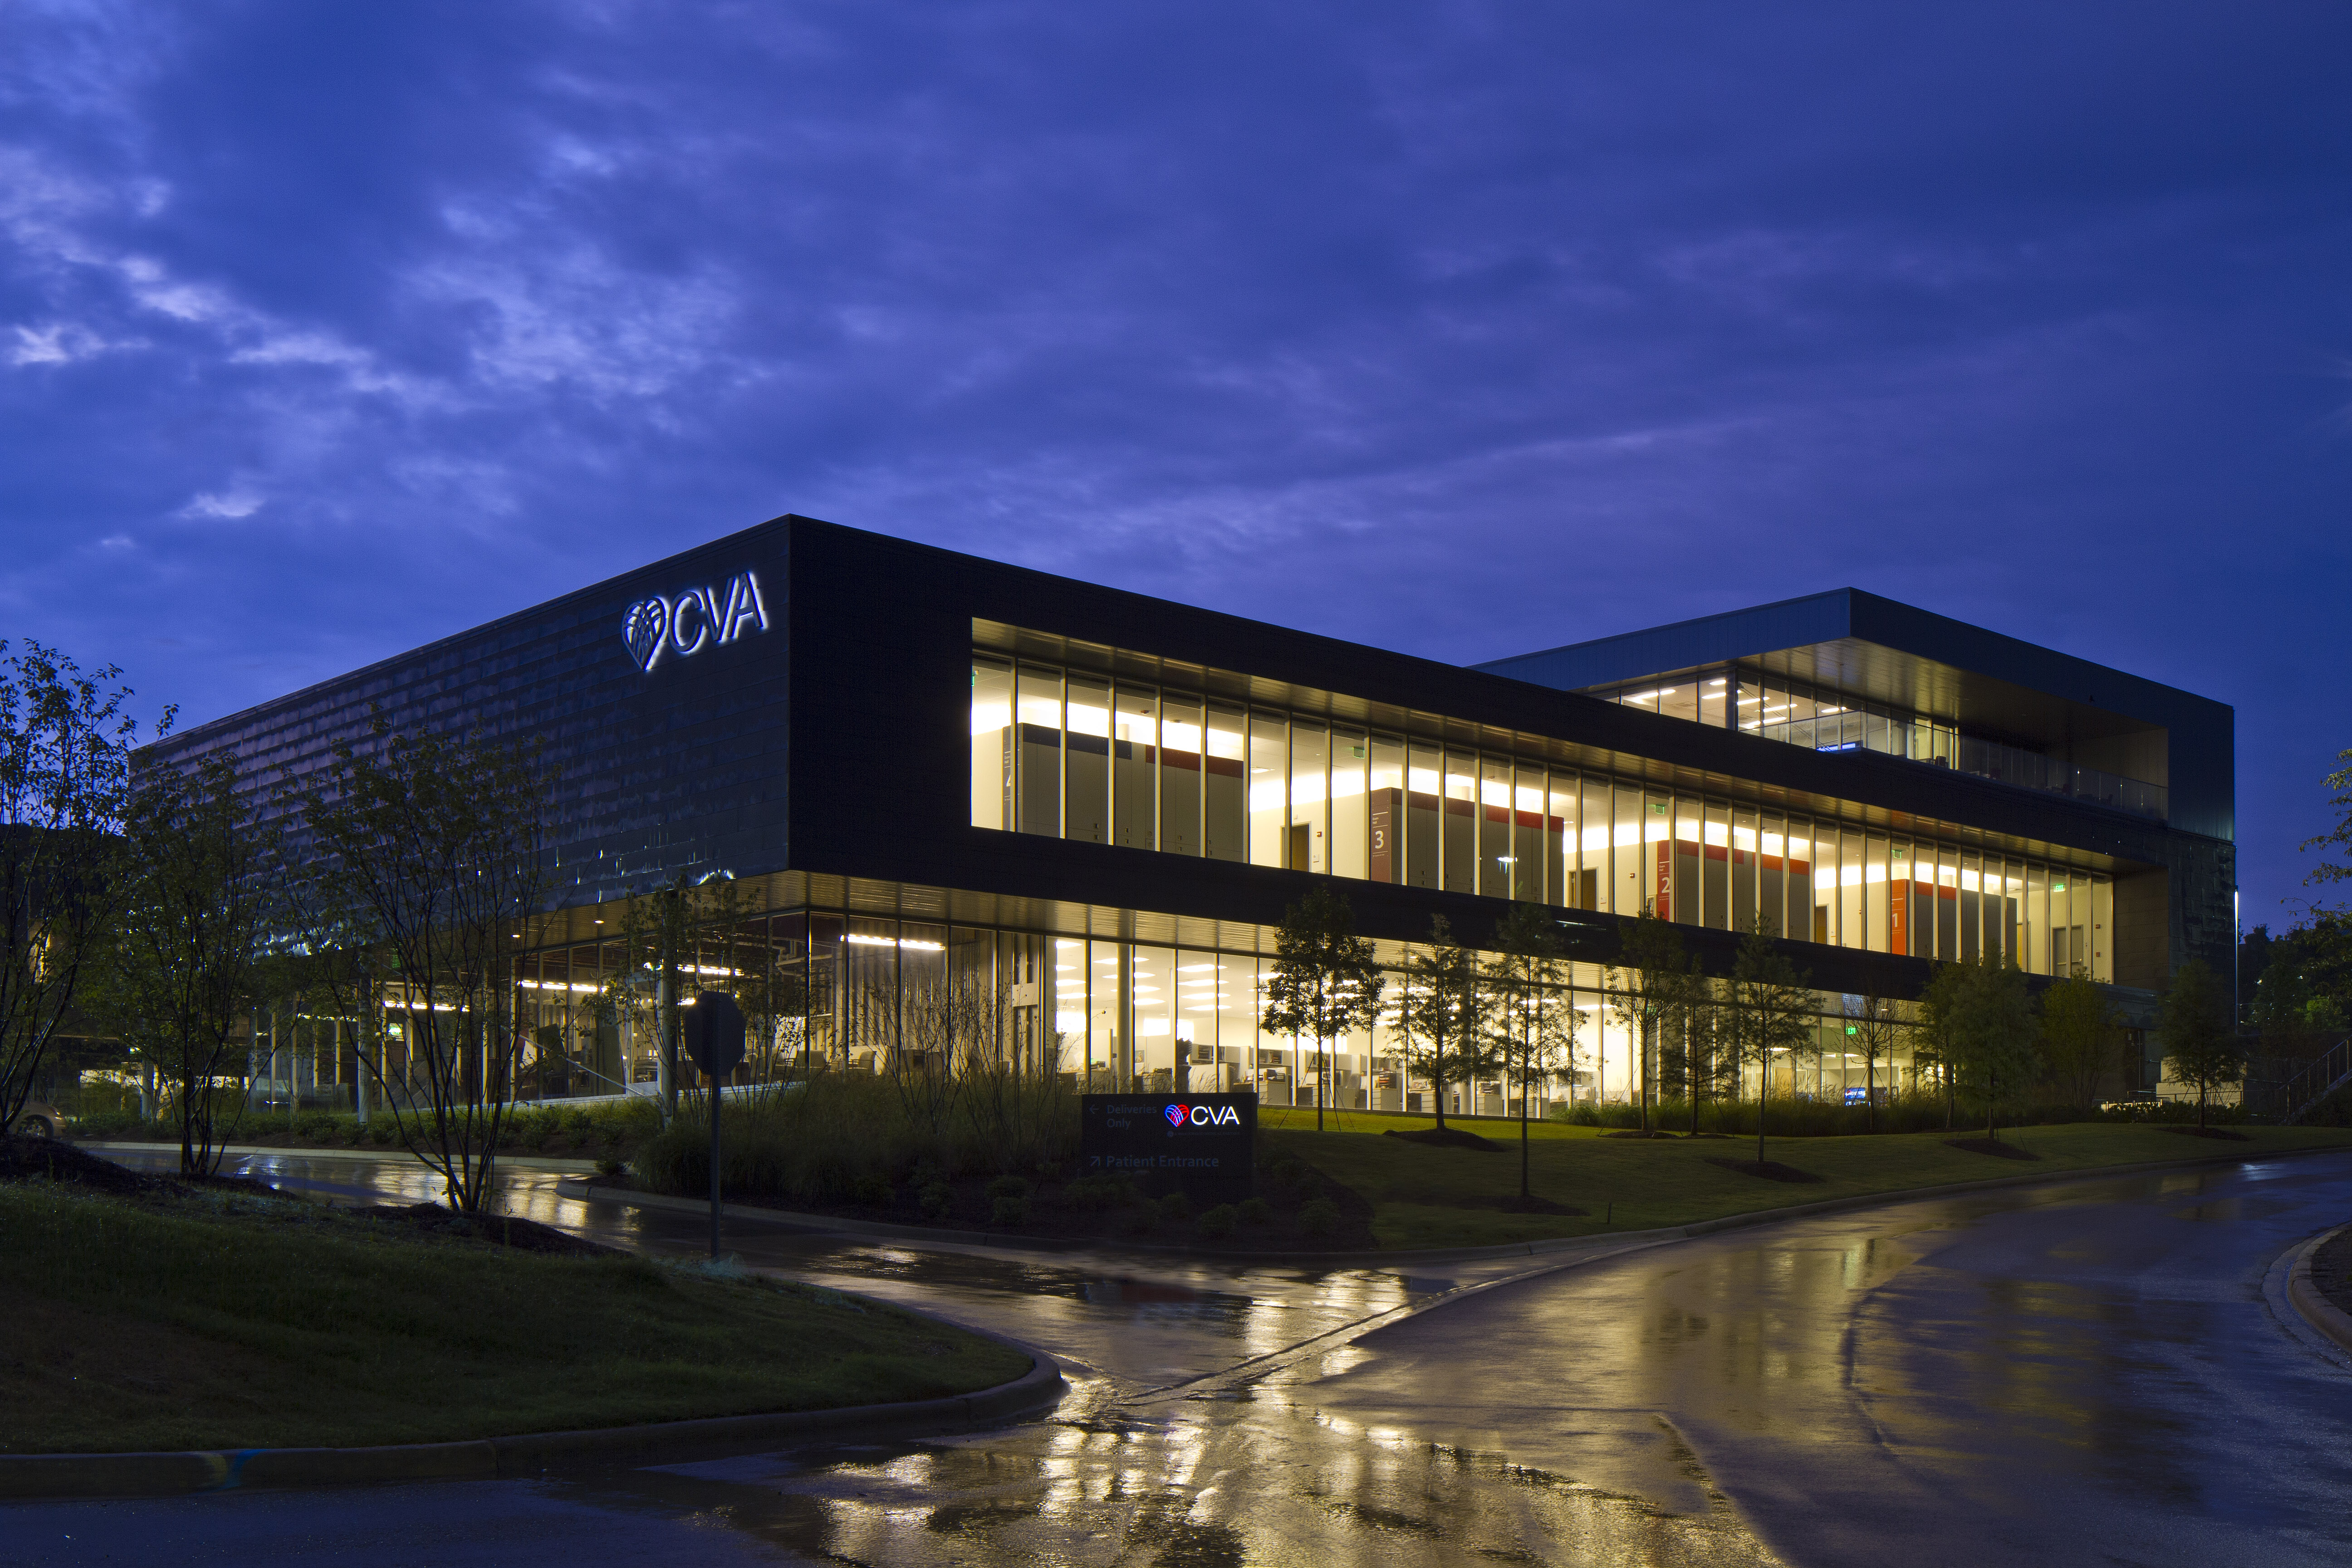 exterior of cardiovascular associates center building